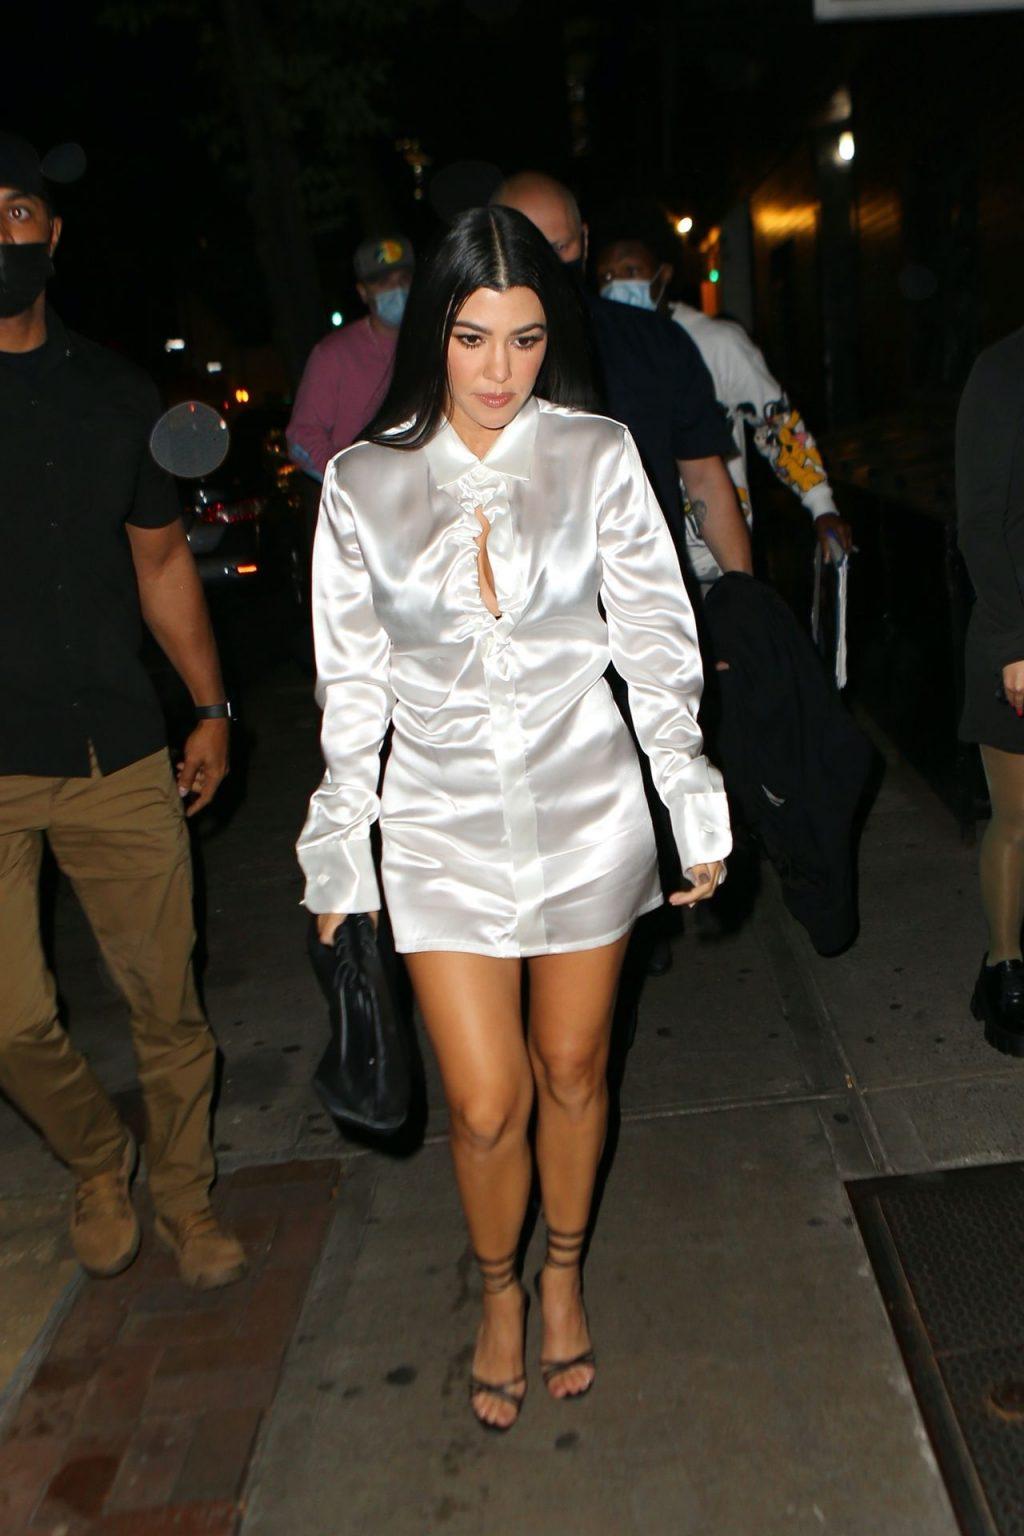 Leggy Kourtney Kardashian & Addison Rae Step Out for Dinner (39 Photos)